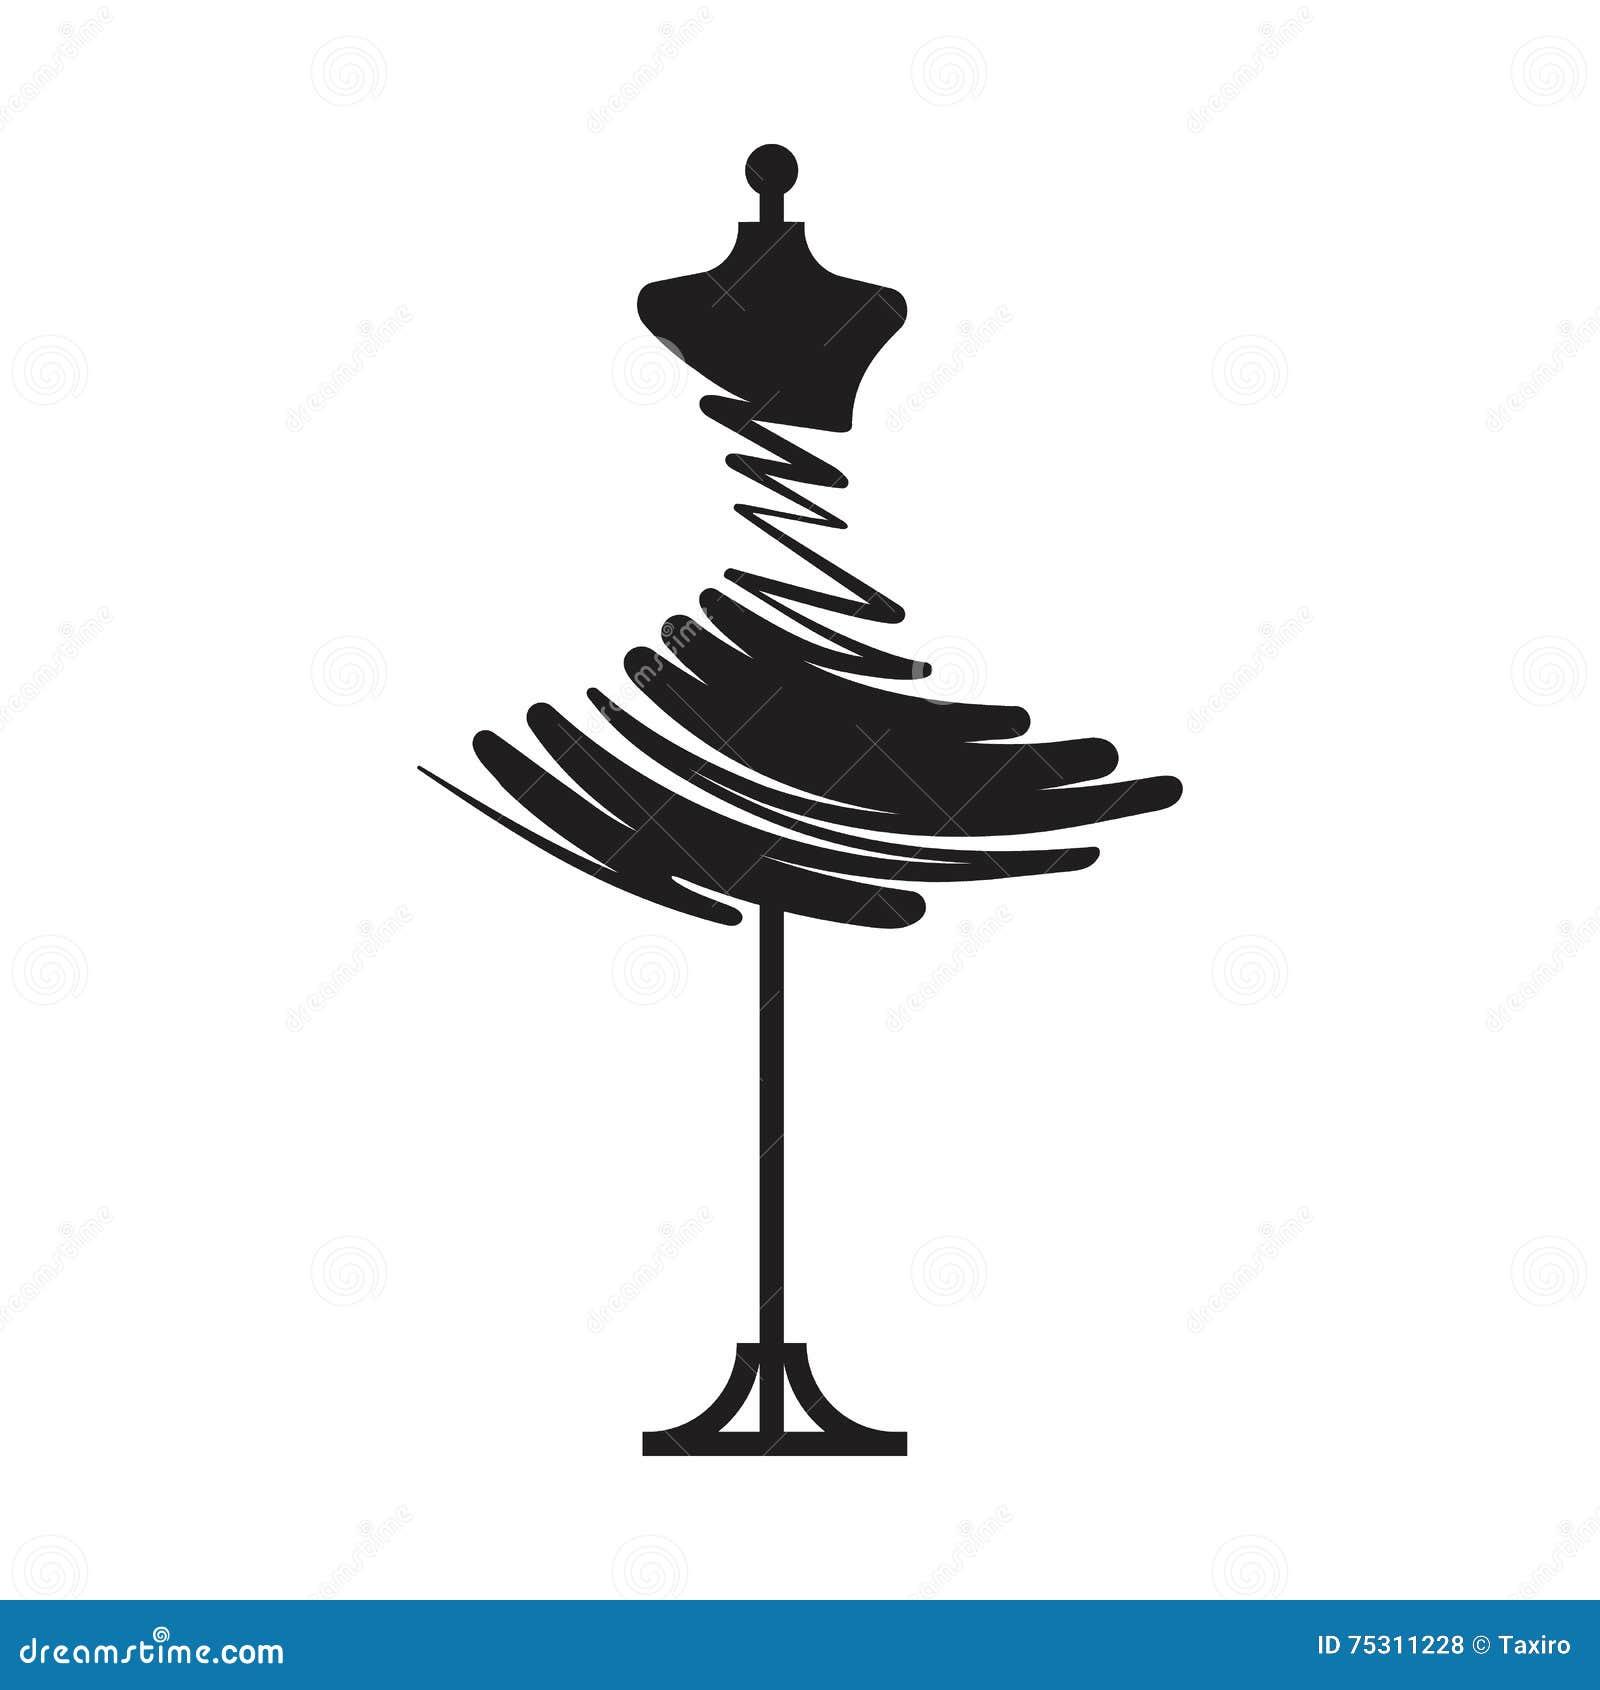 Wedding Dress Clothing Celebration Outline Image Stock Vector B327fa694fa68de3 further 1920 S Flapper Style further d1 80 d0 be d0 ba d0 bb d0 b8  d0 b7 d0 b0  d0 be d1 86 d0 b2 d0 b5 d1 82 d1 8f d0 b2 d0 b0 d0 bd d0 b5 moreover Faldas Pantalones 11514730 moreover 1496438. on short dress clip art